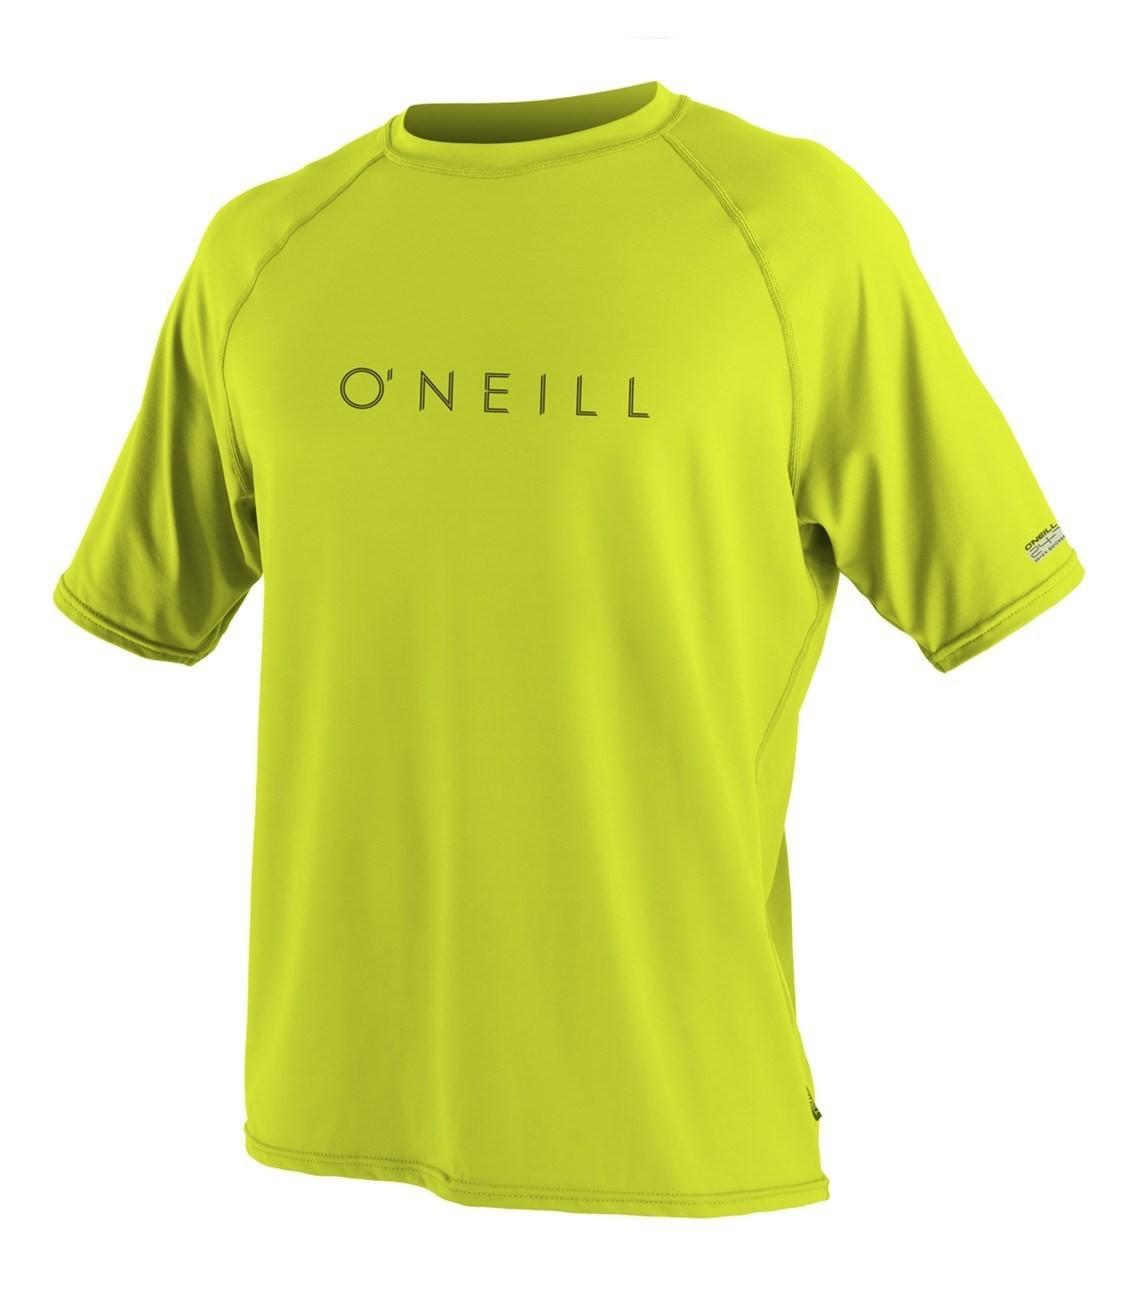 oneill men's short sleeve rash guard lime